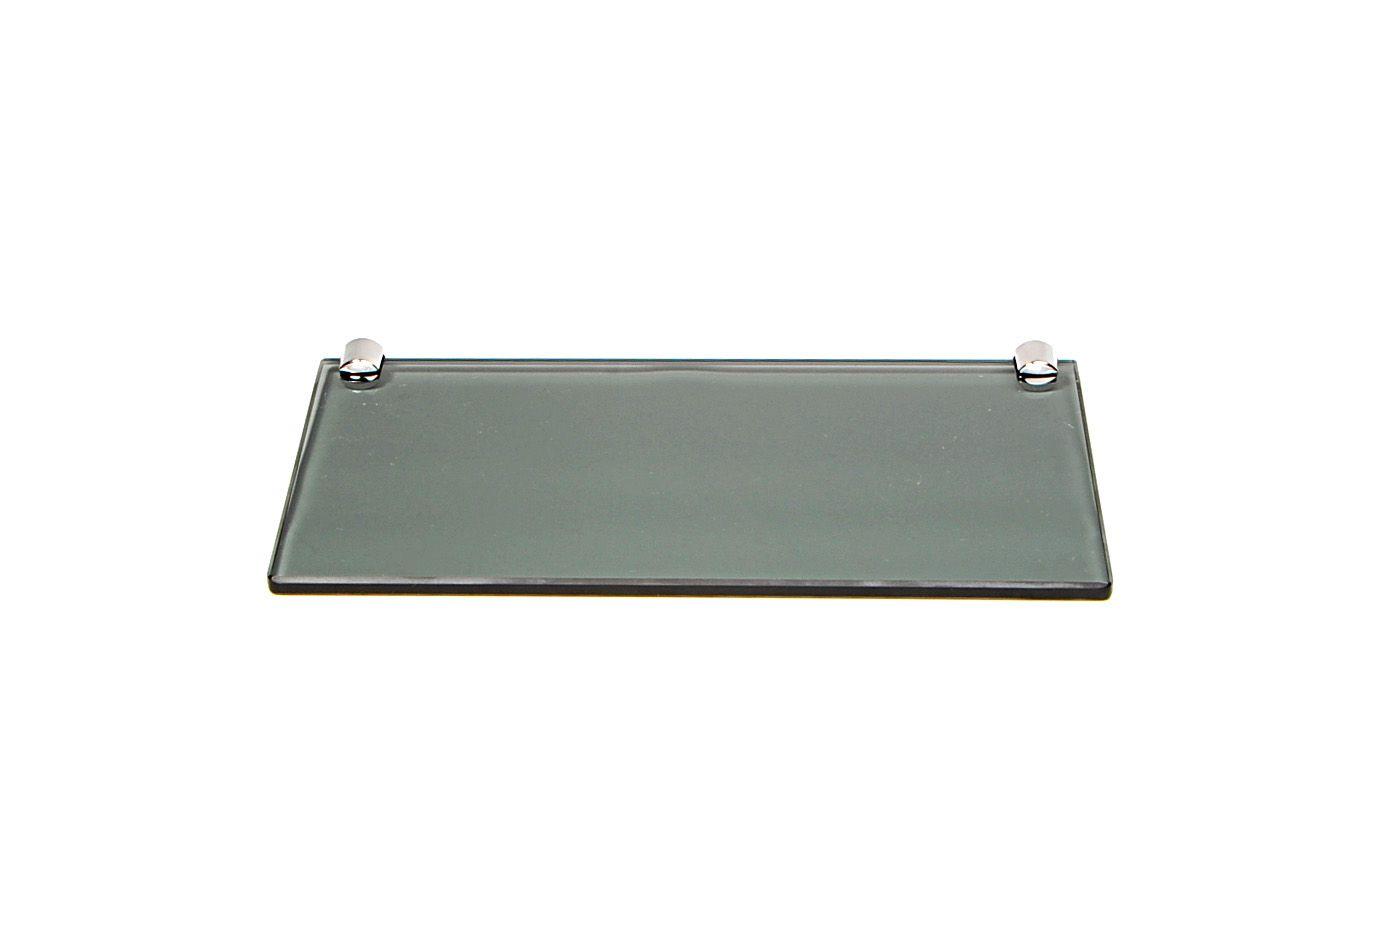 Porta Shampoo Reto em Vidro Fumê Lapidado - Aquabox  - 30cmx14cmx8mm